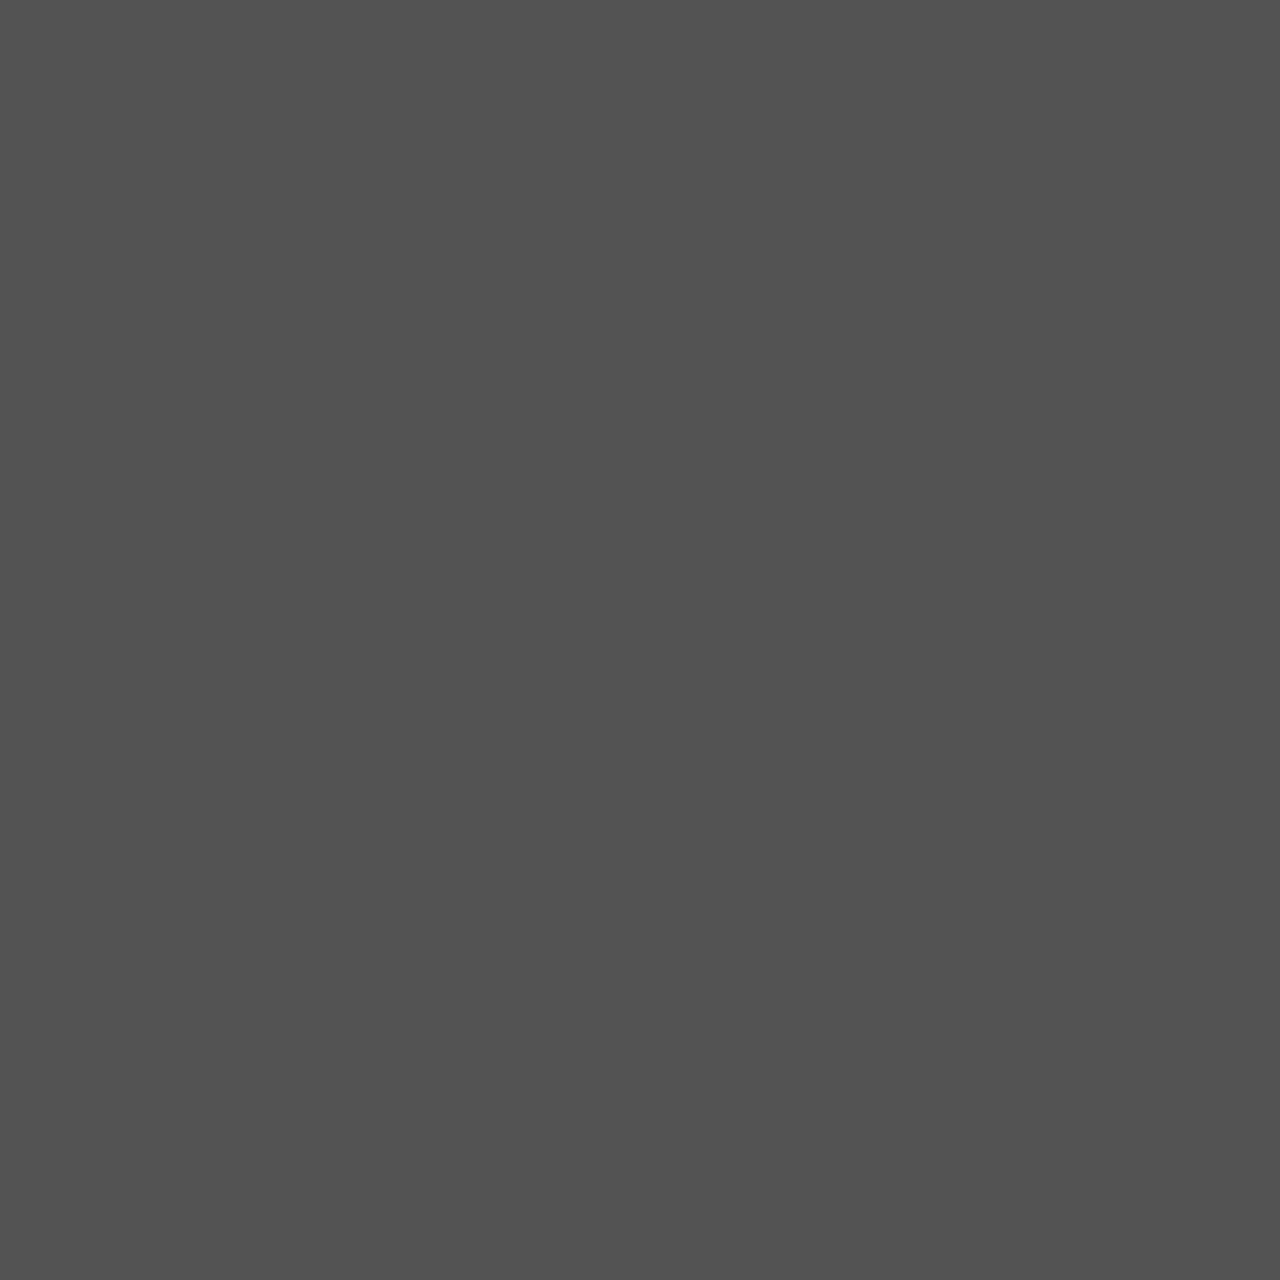 E0-07 Slate Grey